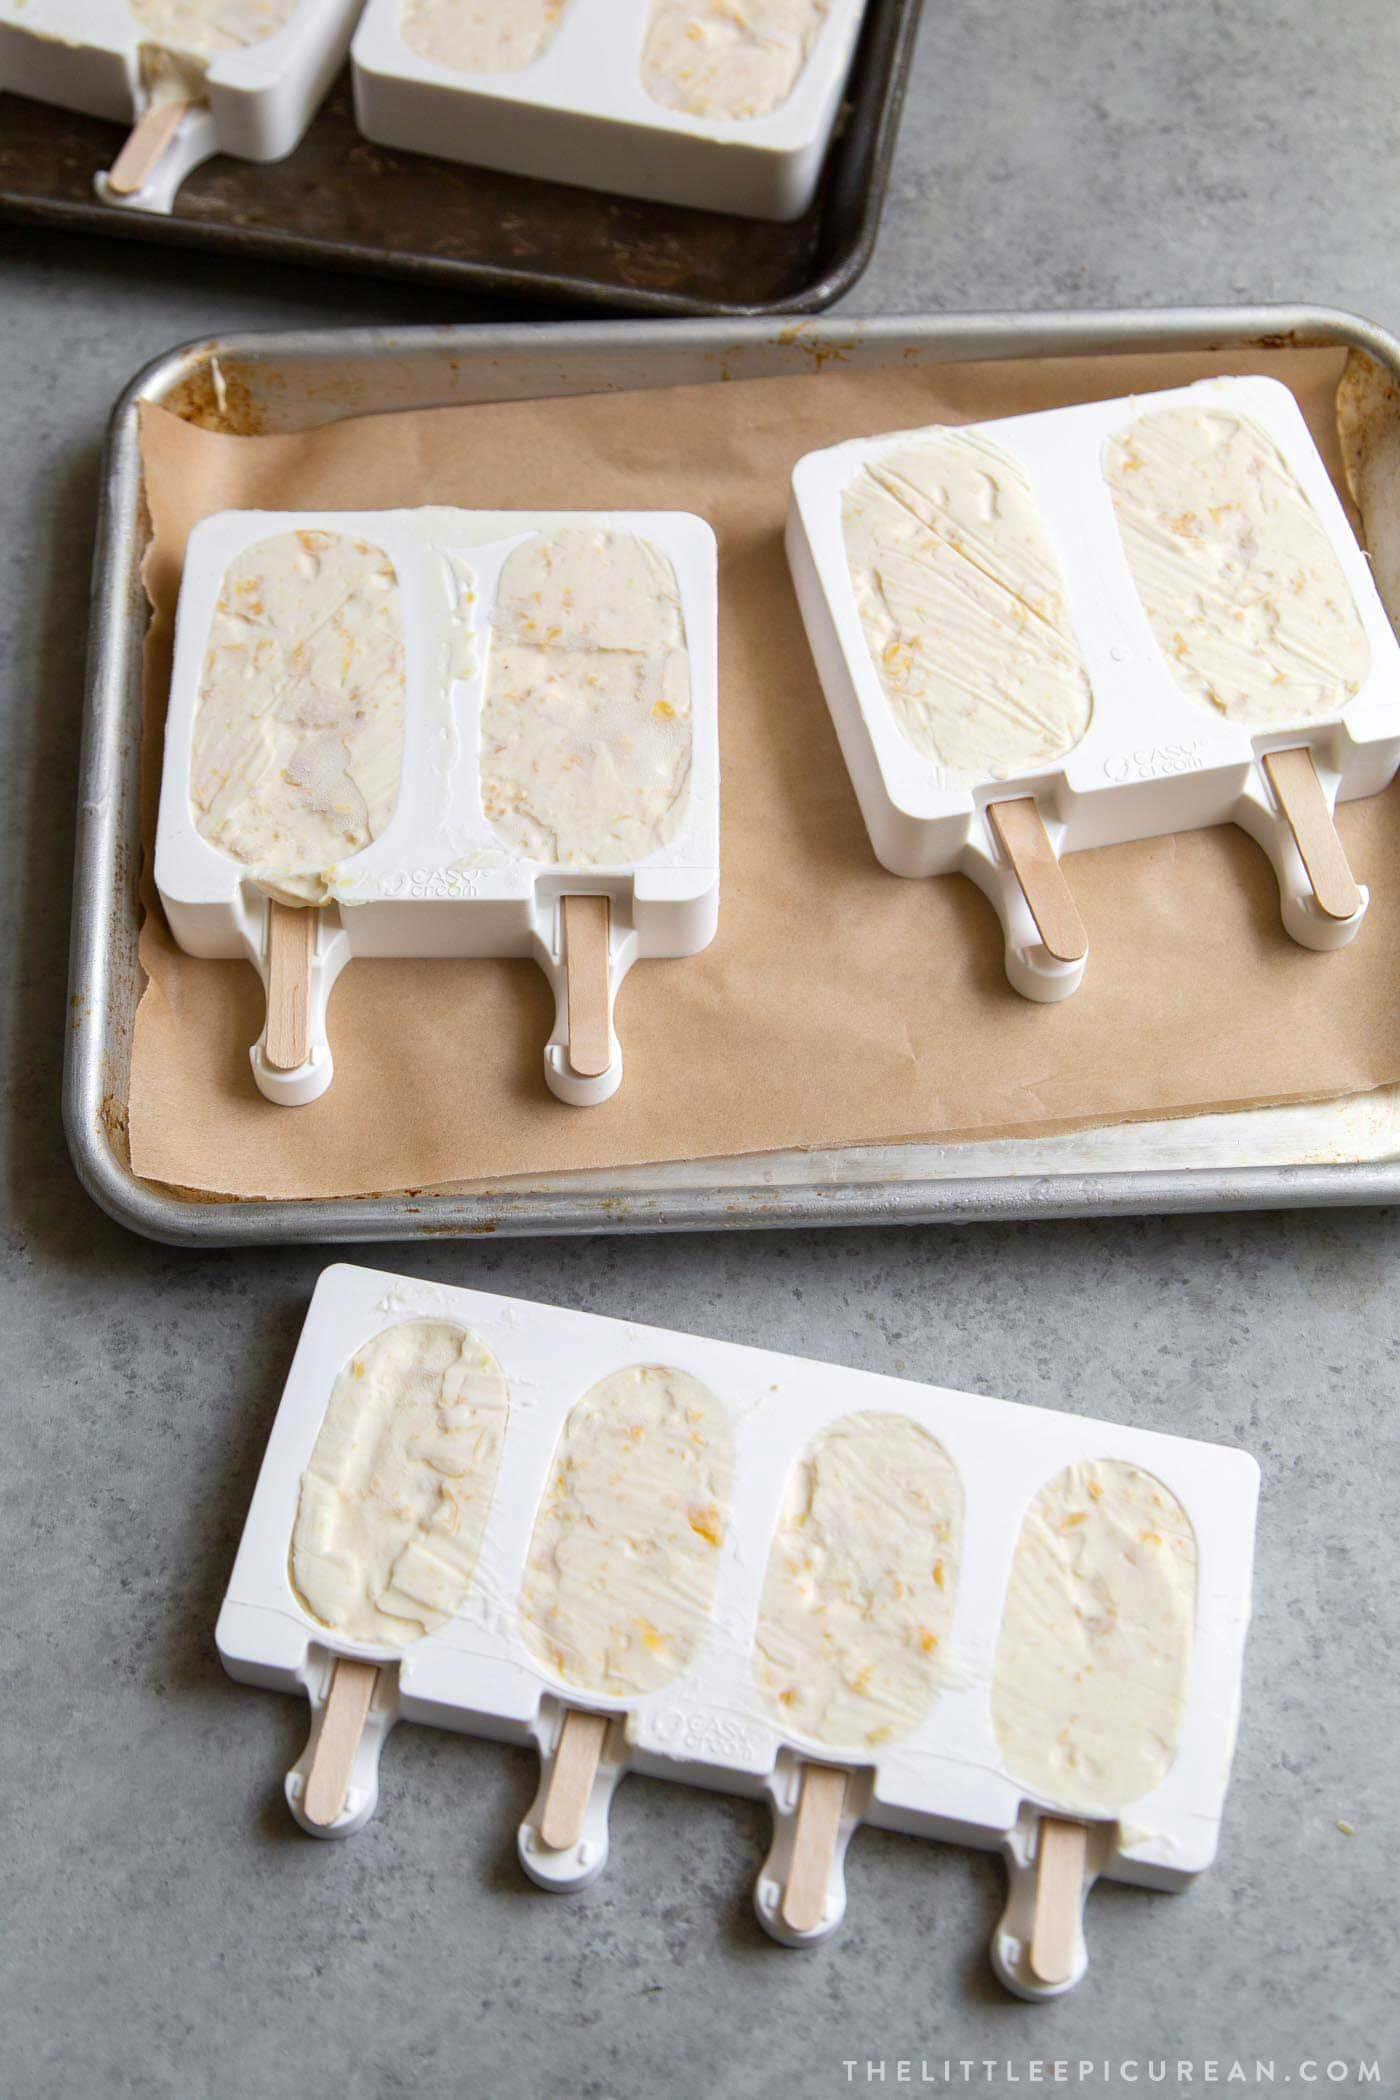 Corn Ice Cream Bars in silicone molds